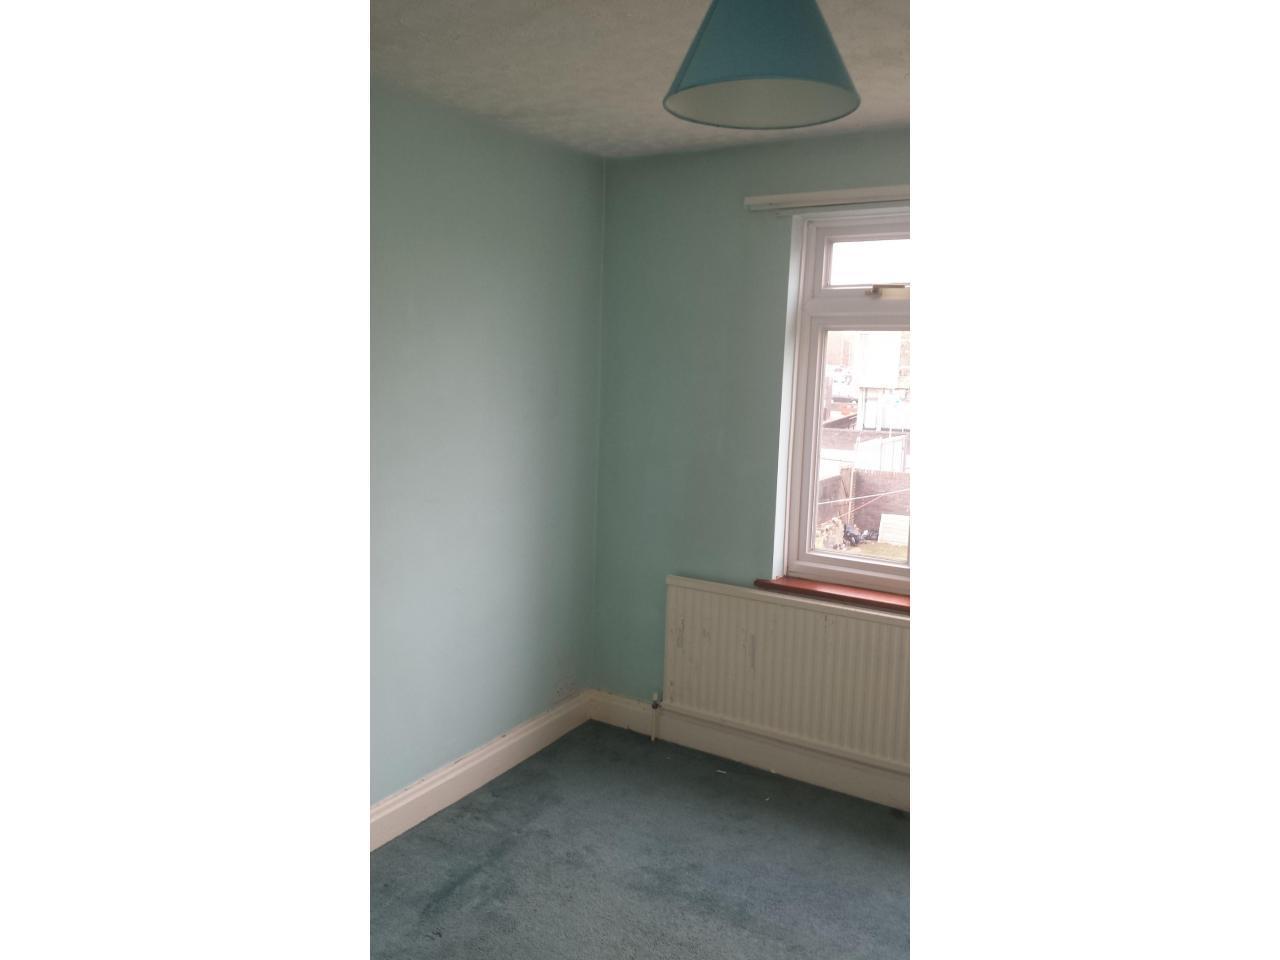 Сингл и Дабл комнаты в аренду на Neasden / Sudbury Hill / Harrow / Greenford. - 6